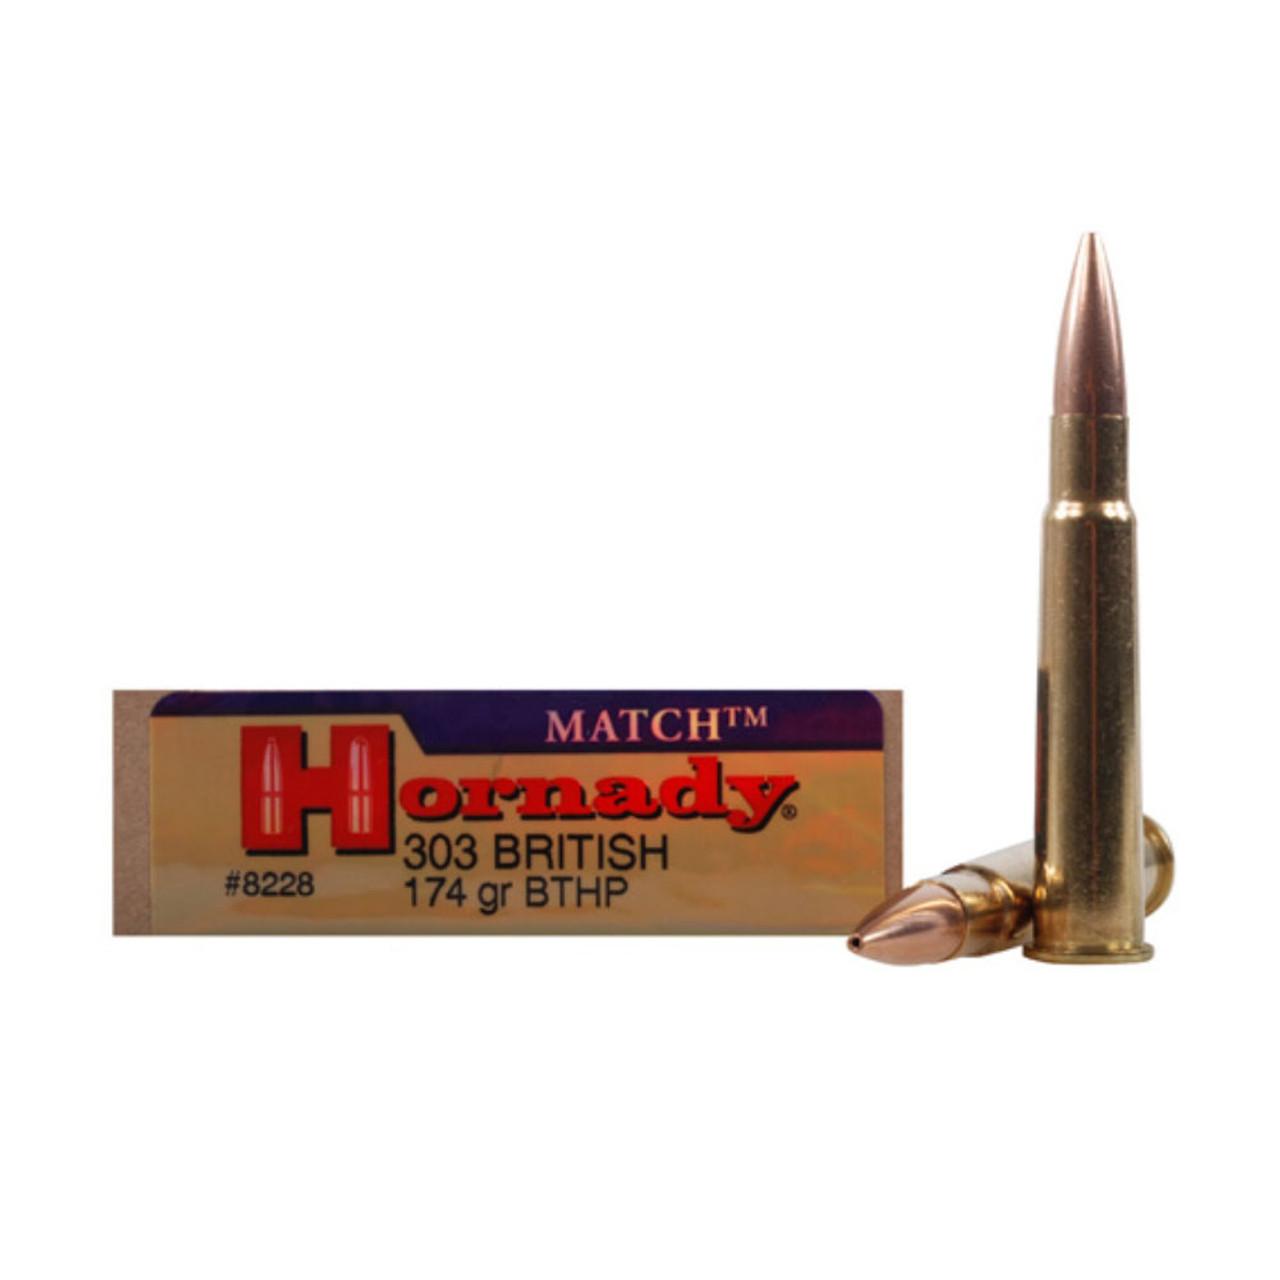 HORNADY Match 303 British 174 Grain BTHP Ammo, 20 Round Box (8228)